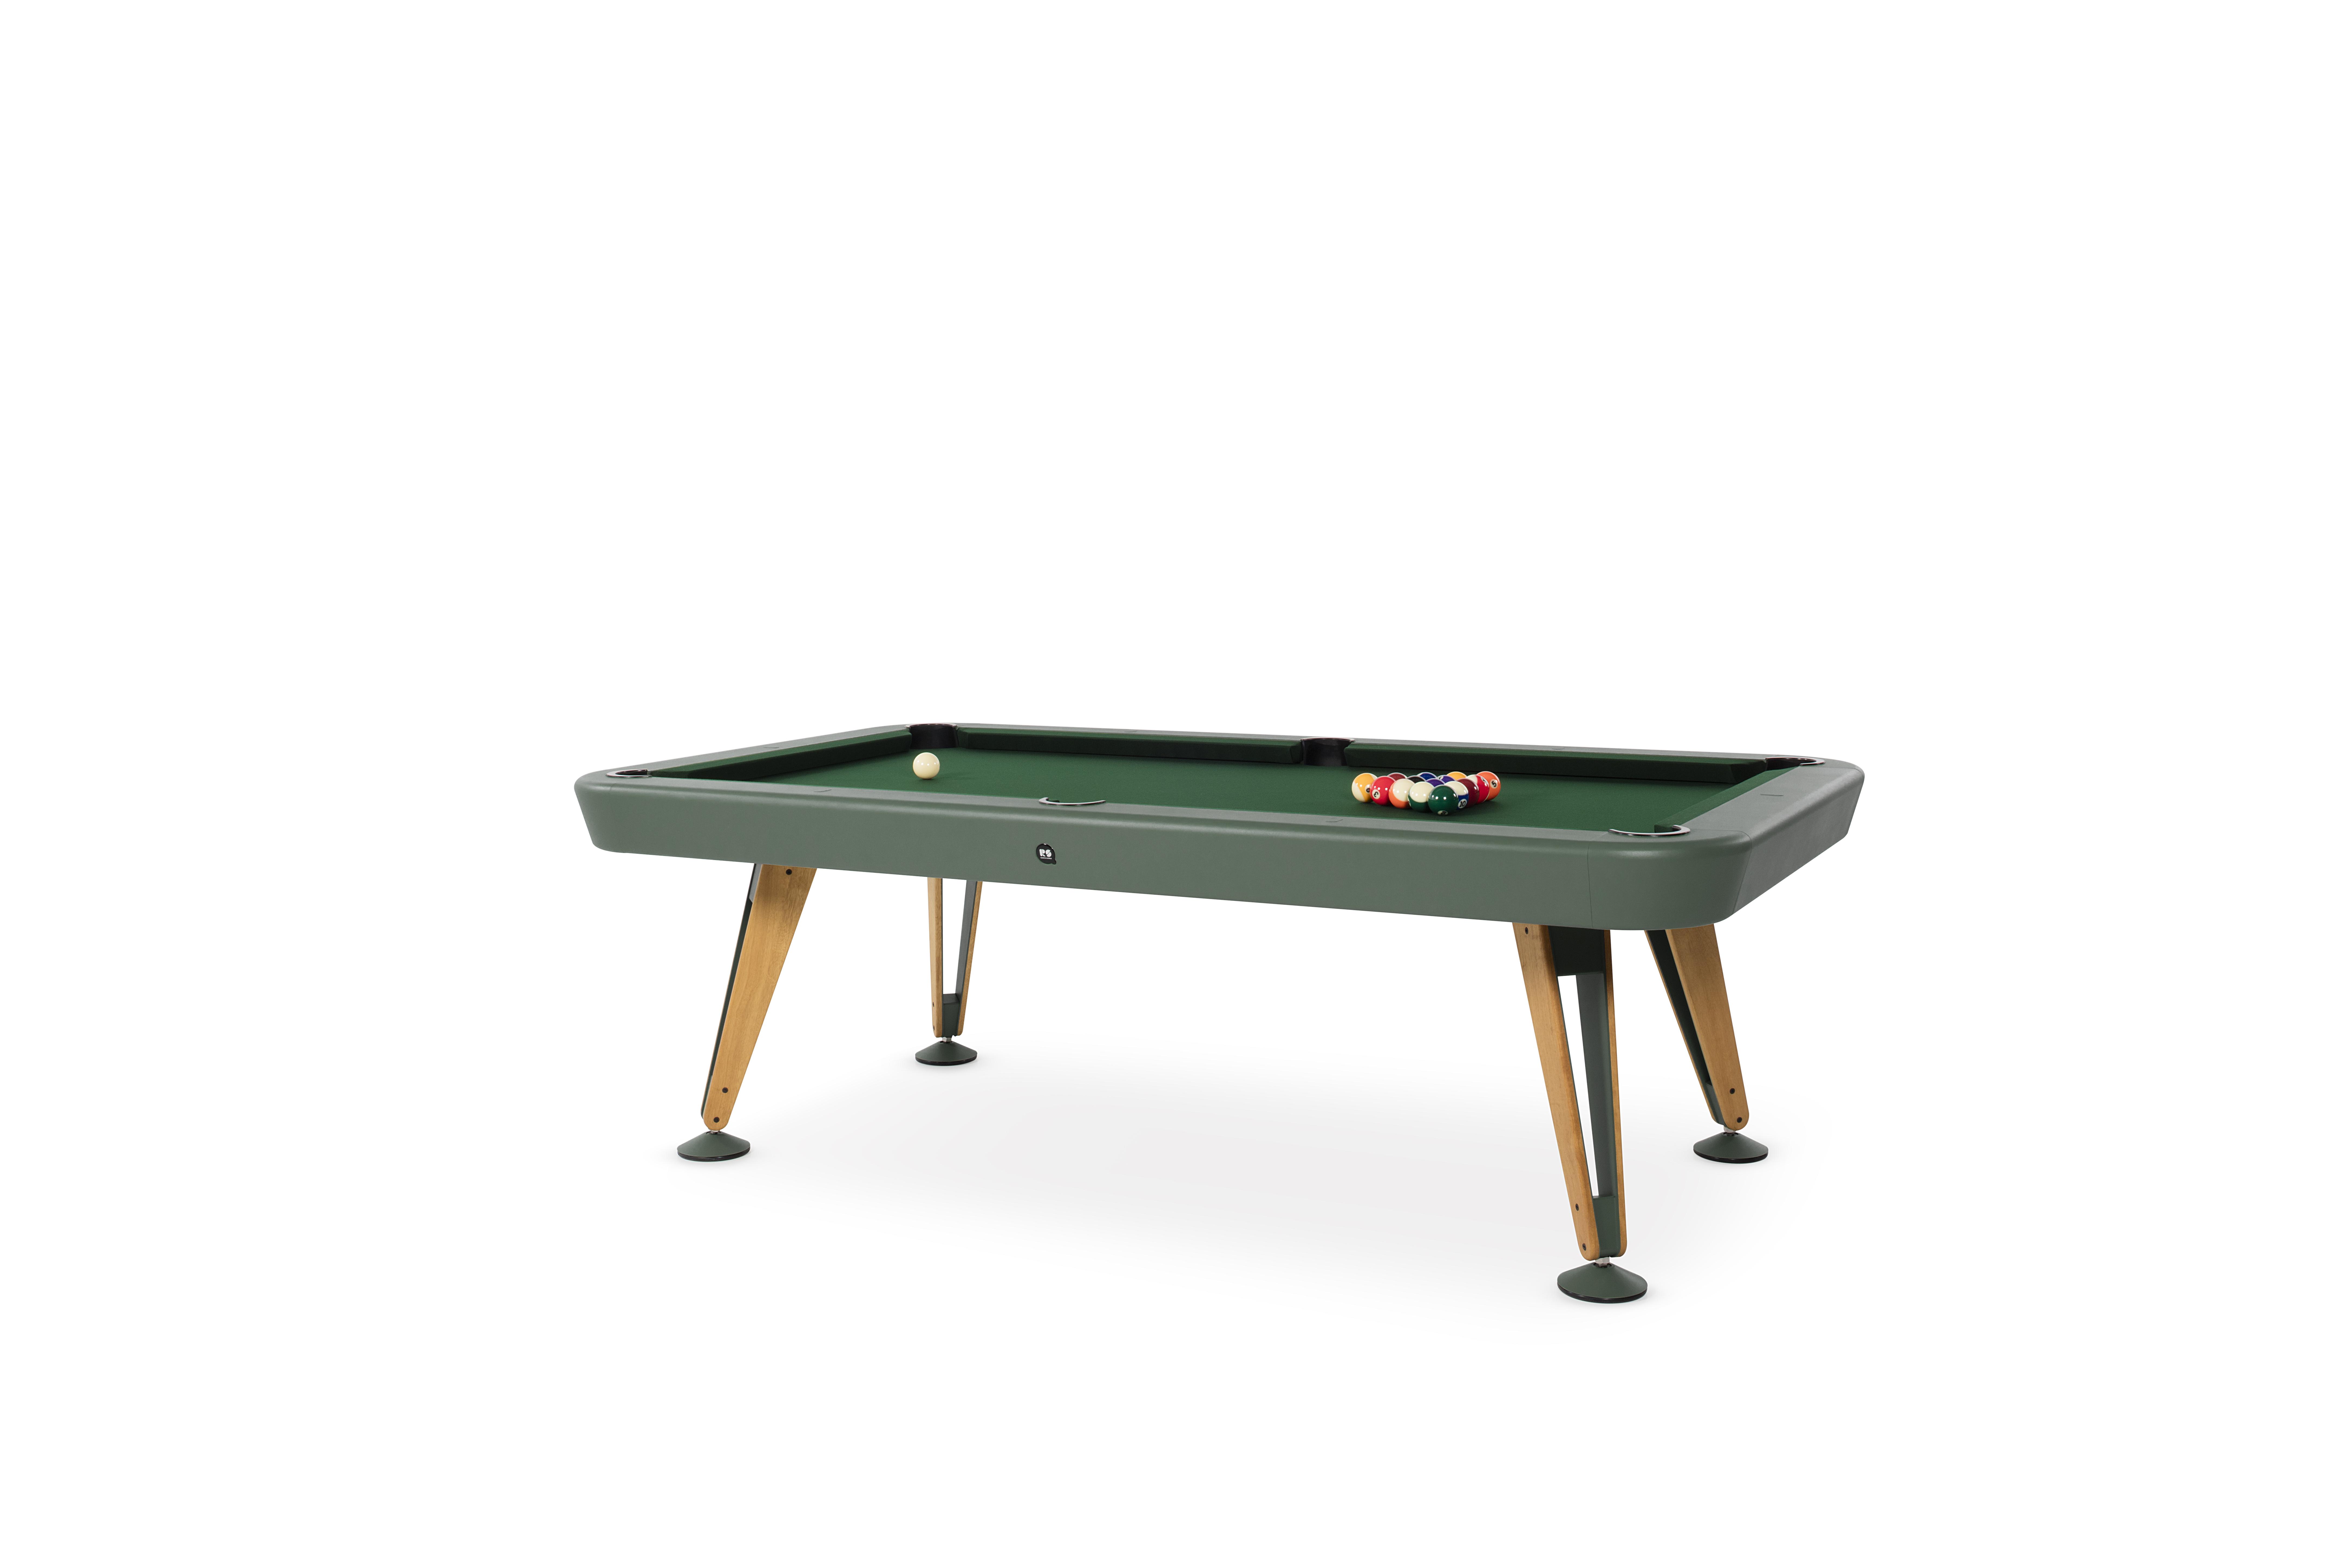 "Billardtisch ""Pool"" - Design Diagonal American 7Fuss von RS Barcelona (in- oder outdoor)"